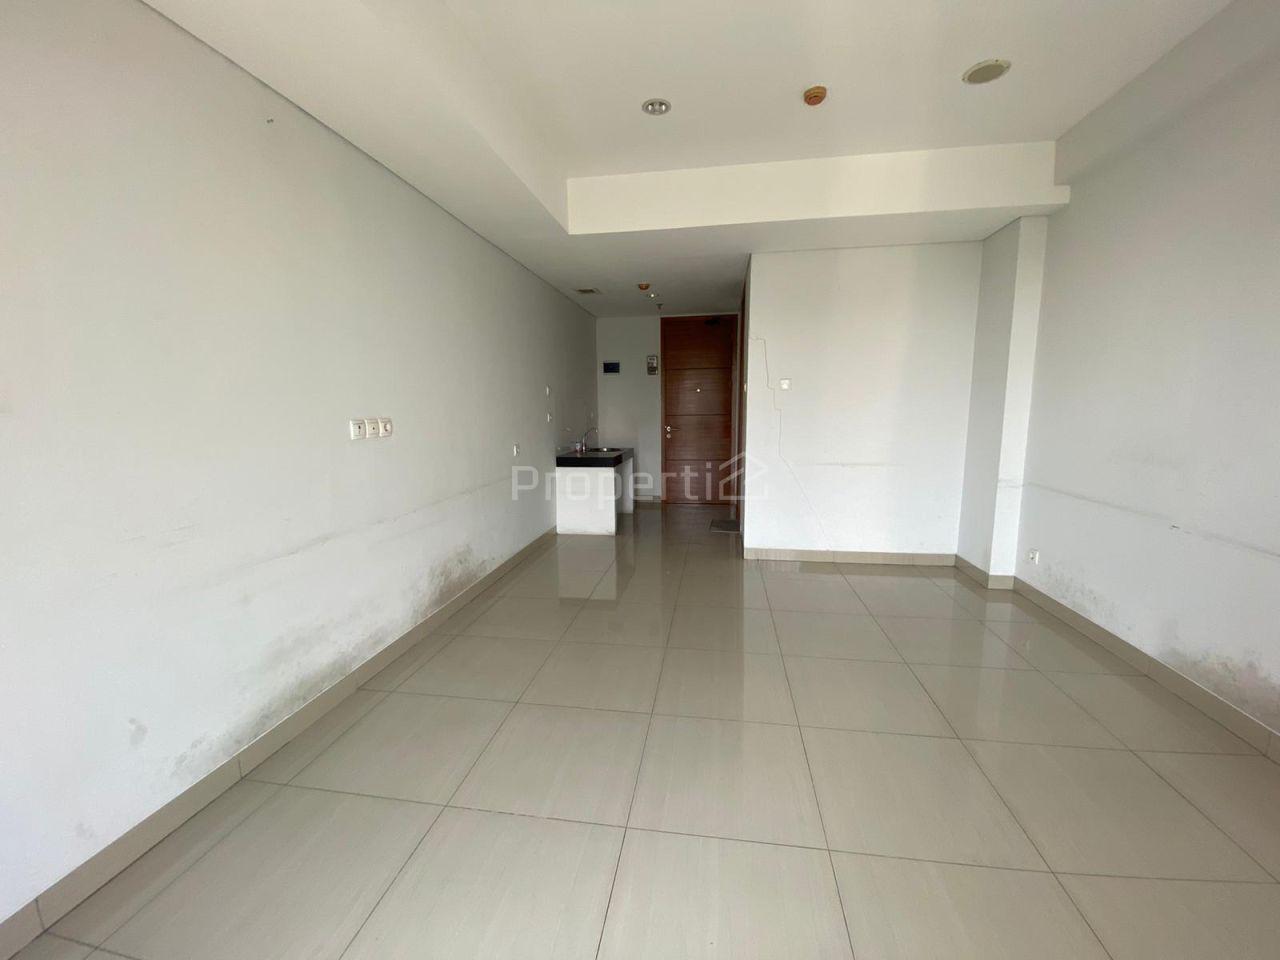 2 Unit Apartemen Studio di Apartemen Dago Suites, Lantai 6, Kota Bandung